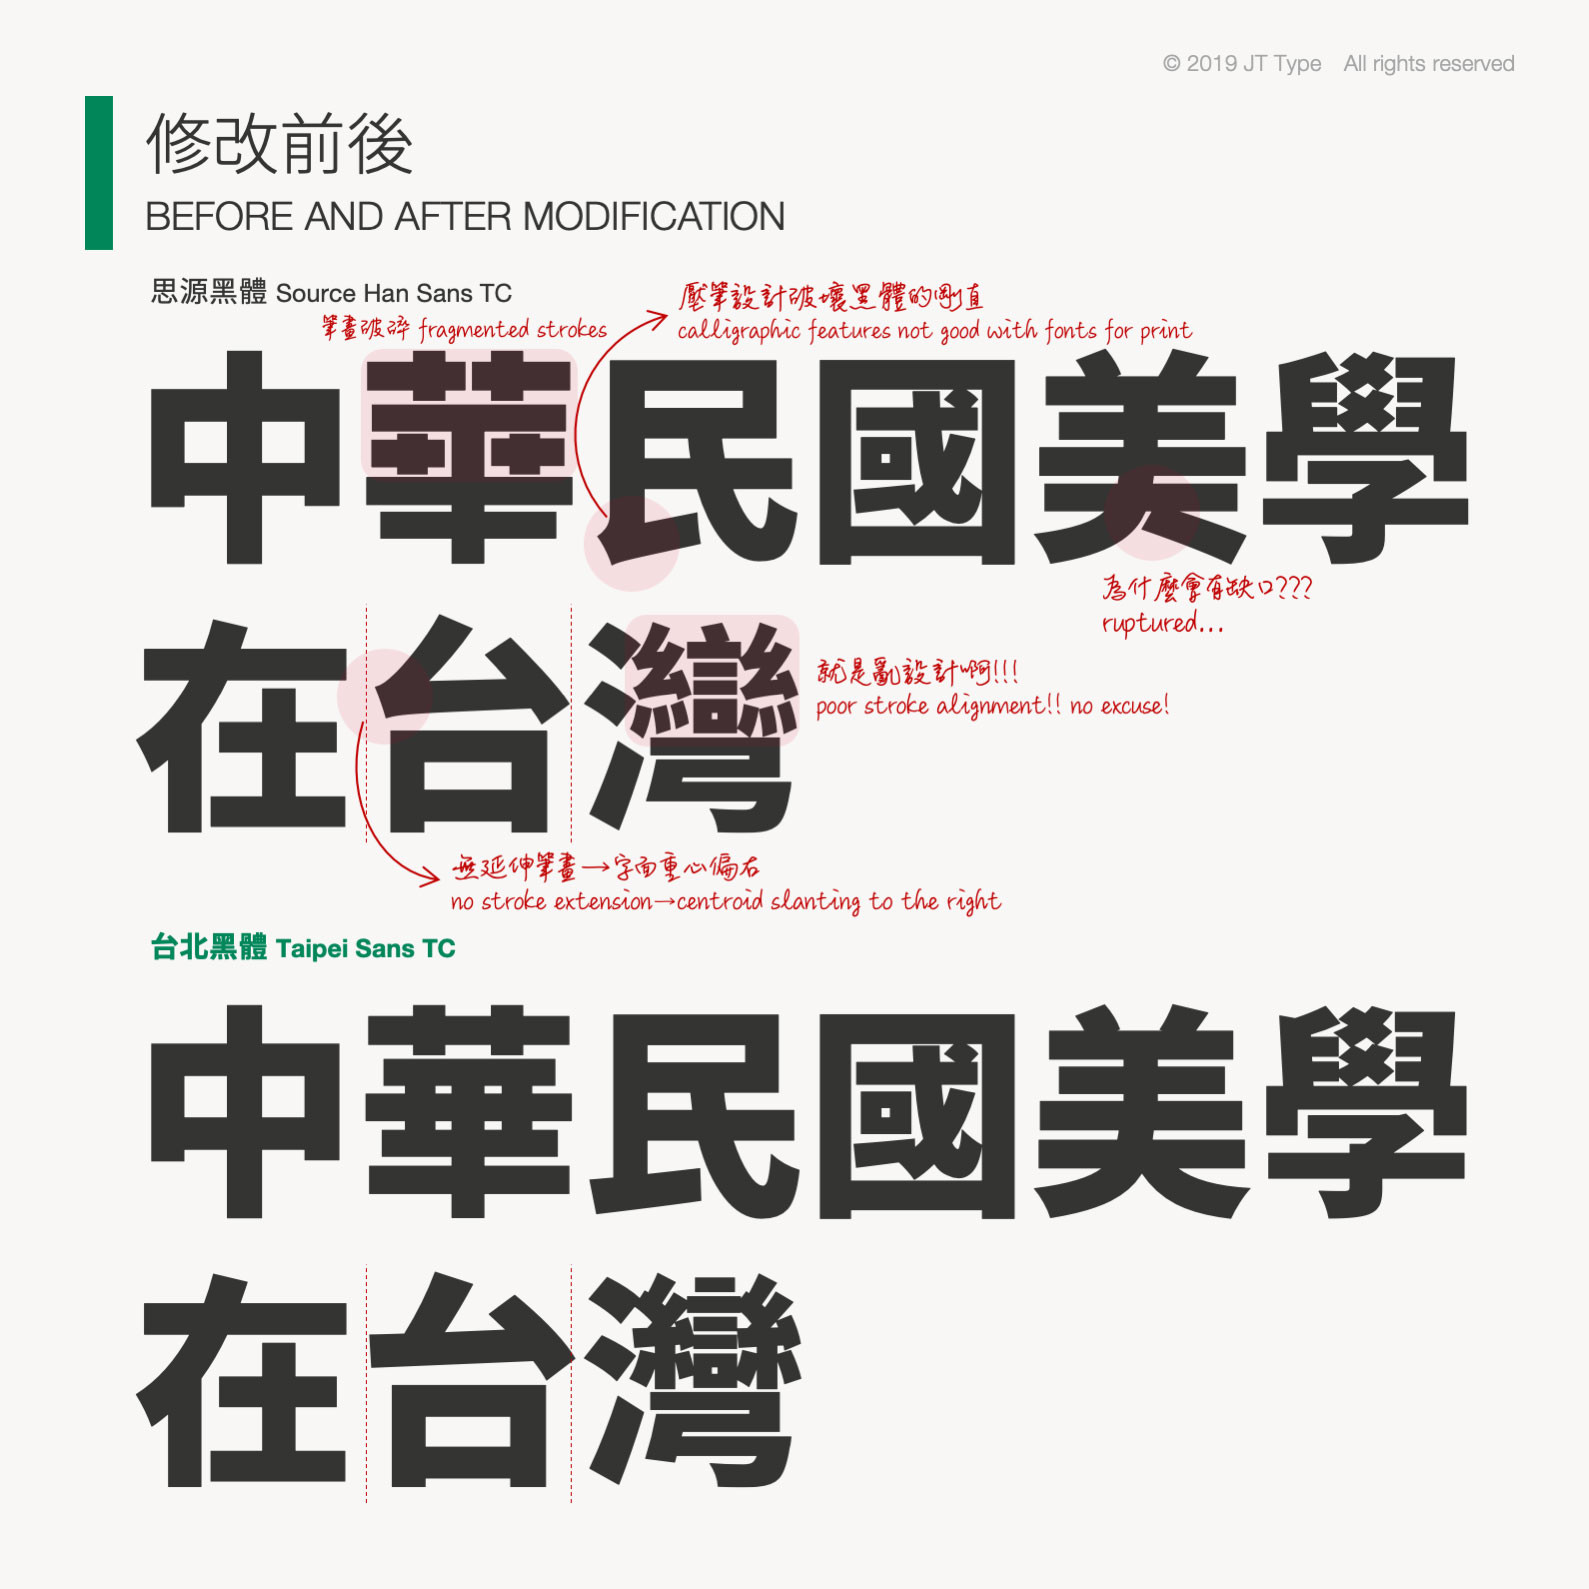 Font, Design, Logo, Taiwan, Brand, Product design, Line, Product, One Taiwan, one taiwan, Font, Text, Graphic design, Illustration